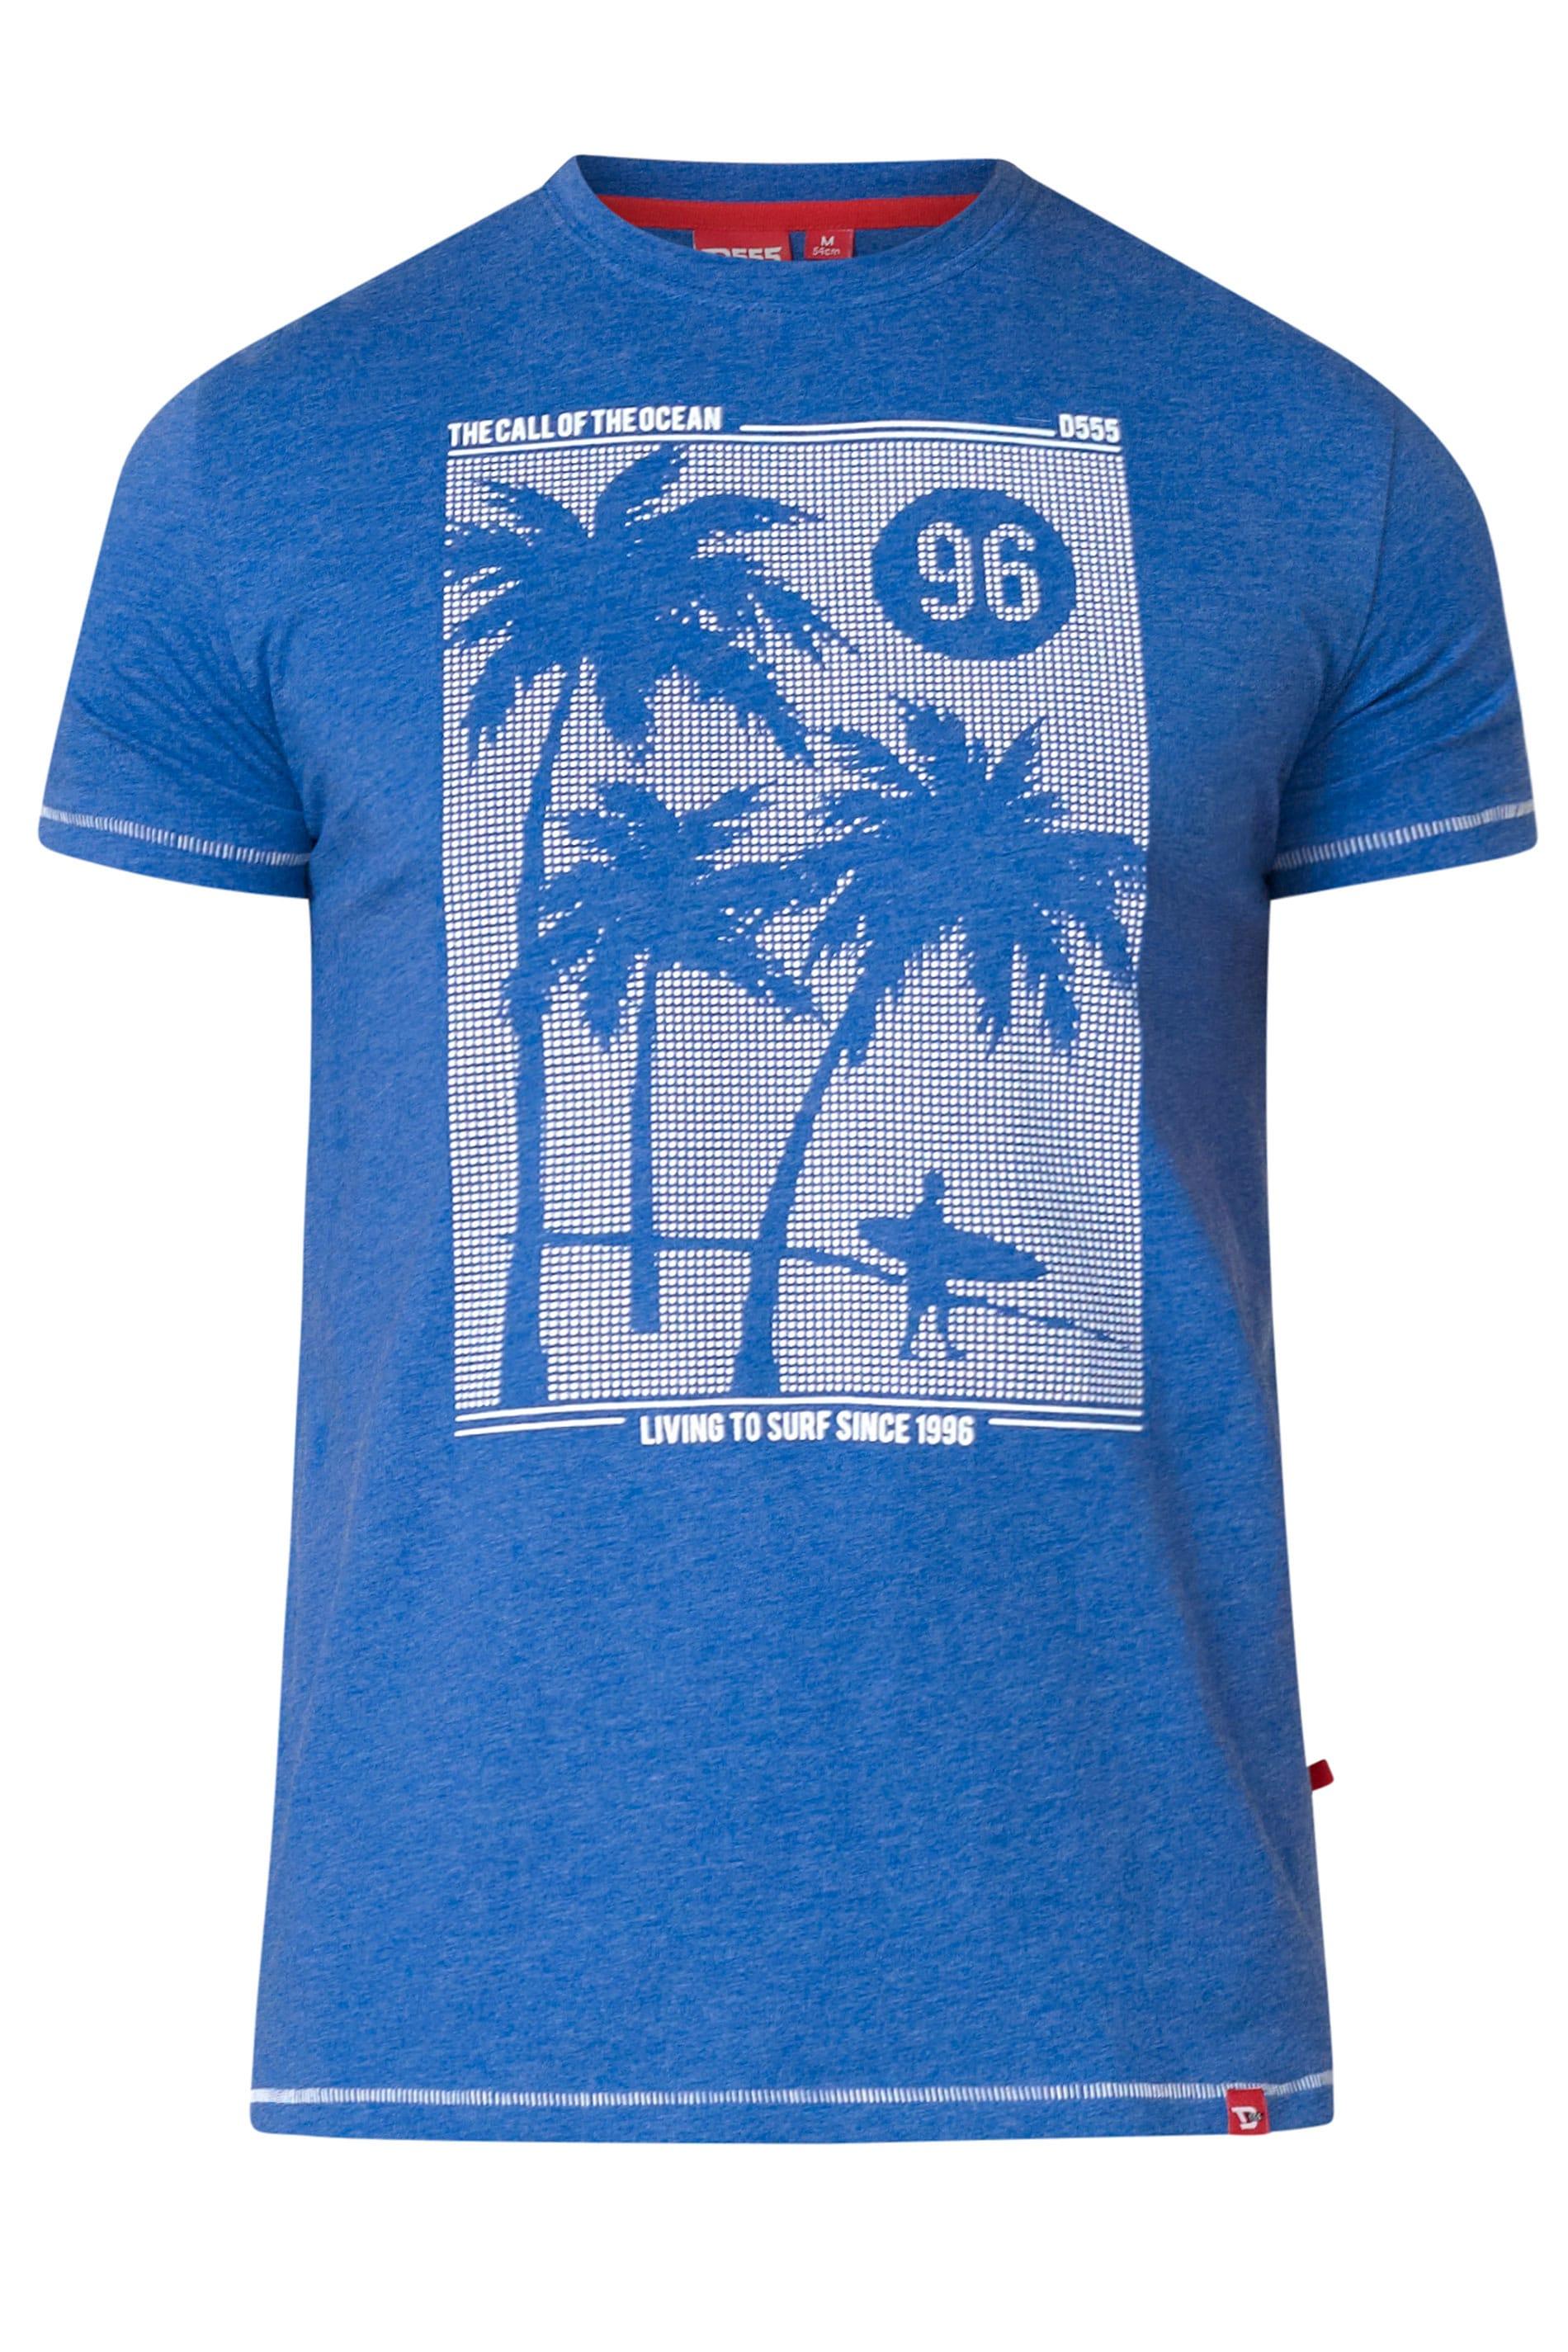 D555 Blue Marl Palm Tree Graphic Print T-Shirt